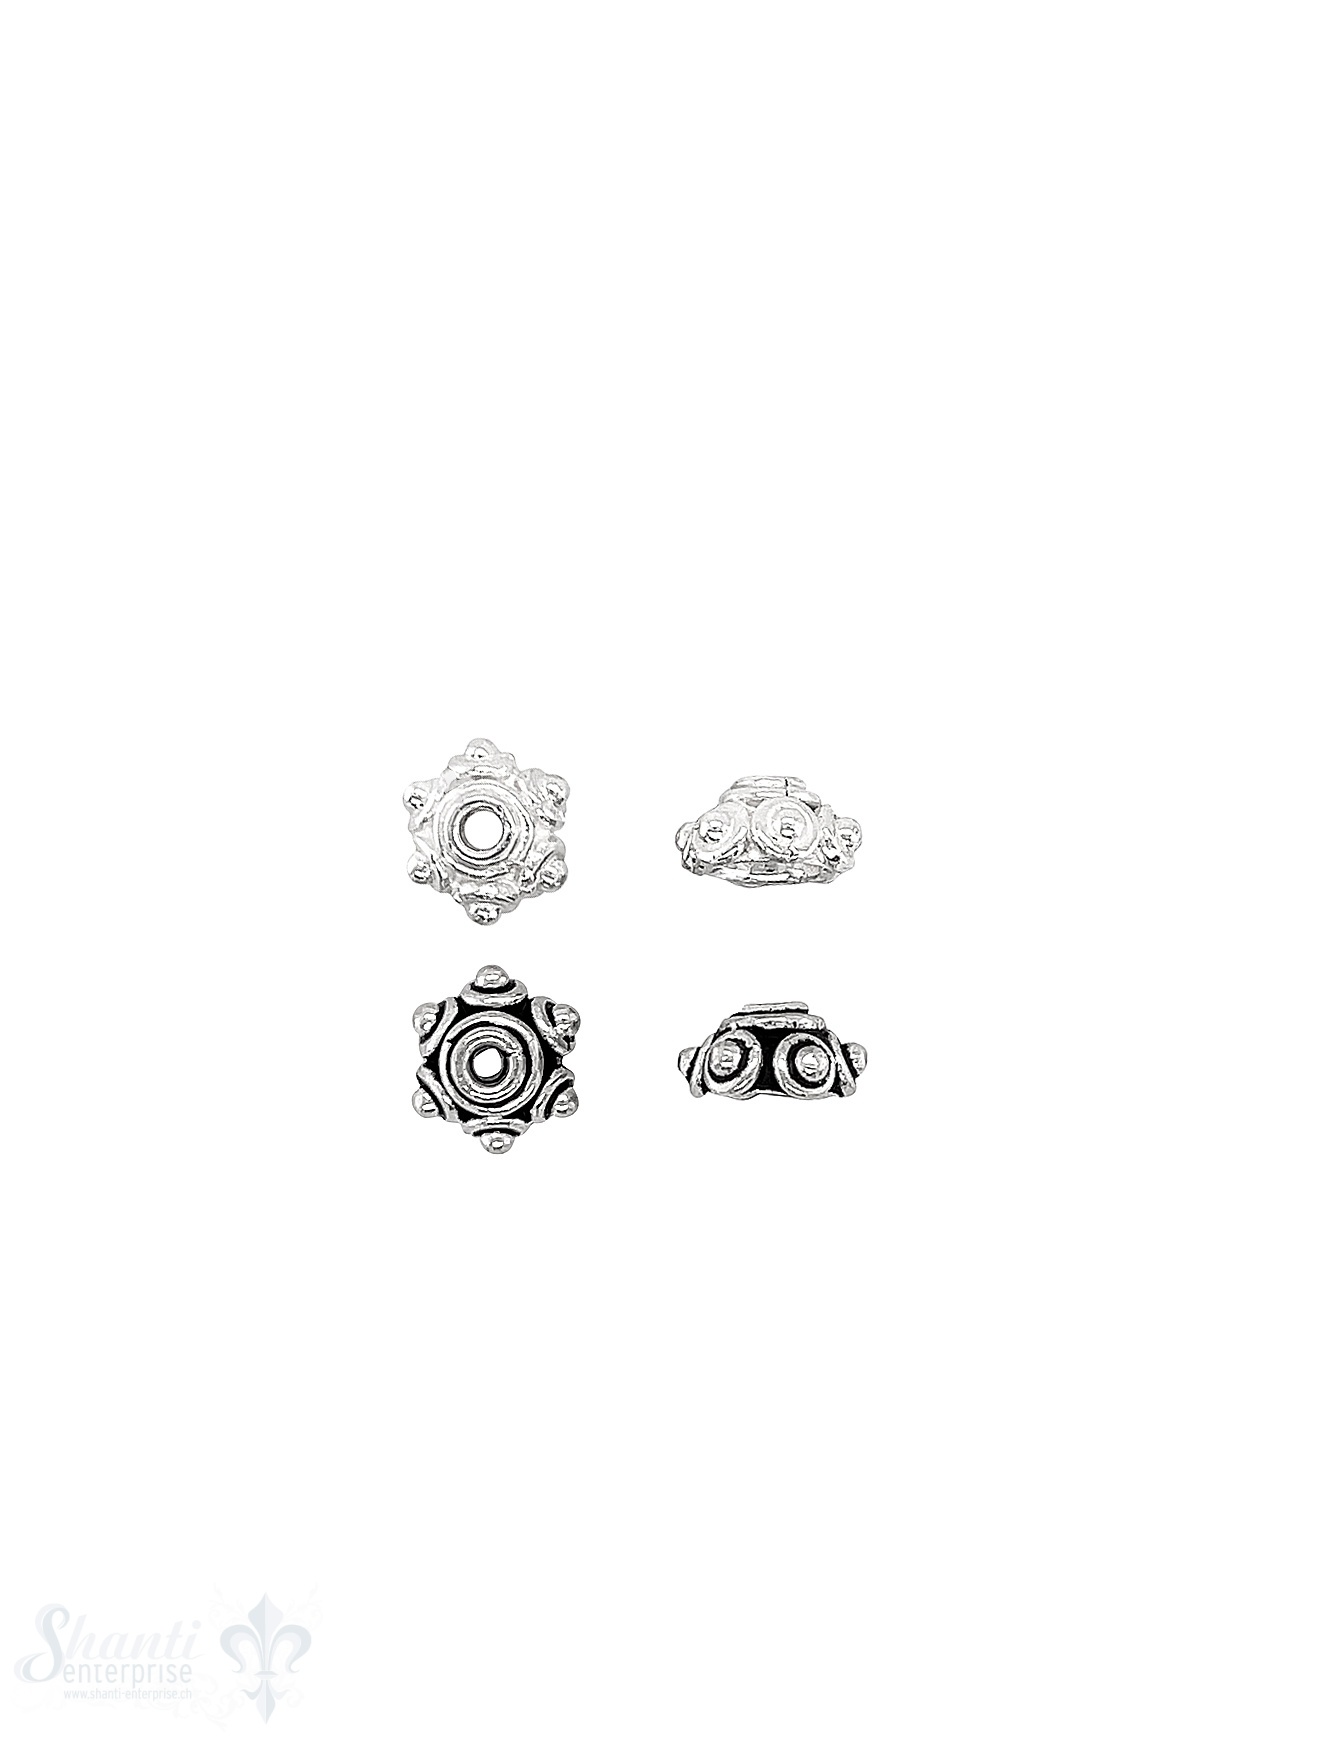 Noppen Perlkappe 8x4,6 mm eingekreis Doppelrand grob Silber ID 1.7 mm 1 Pack = 6 Stk. ca. 5 gr.